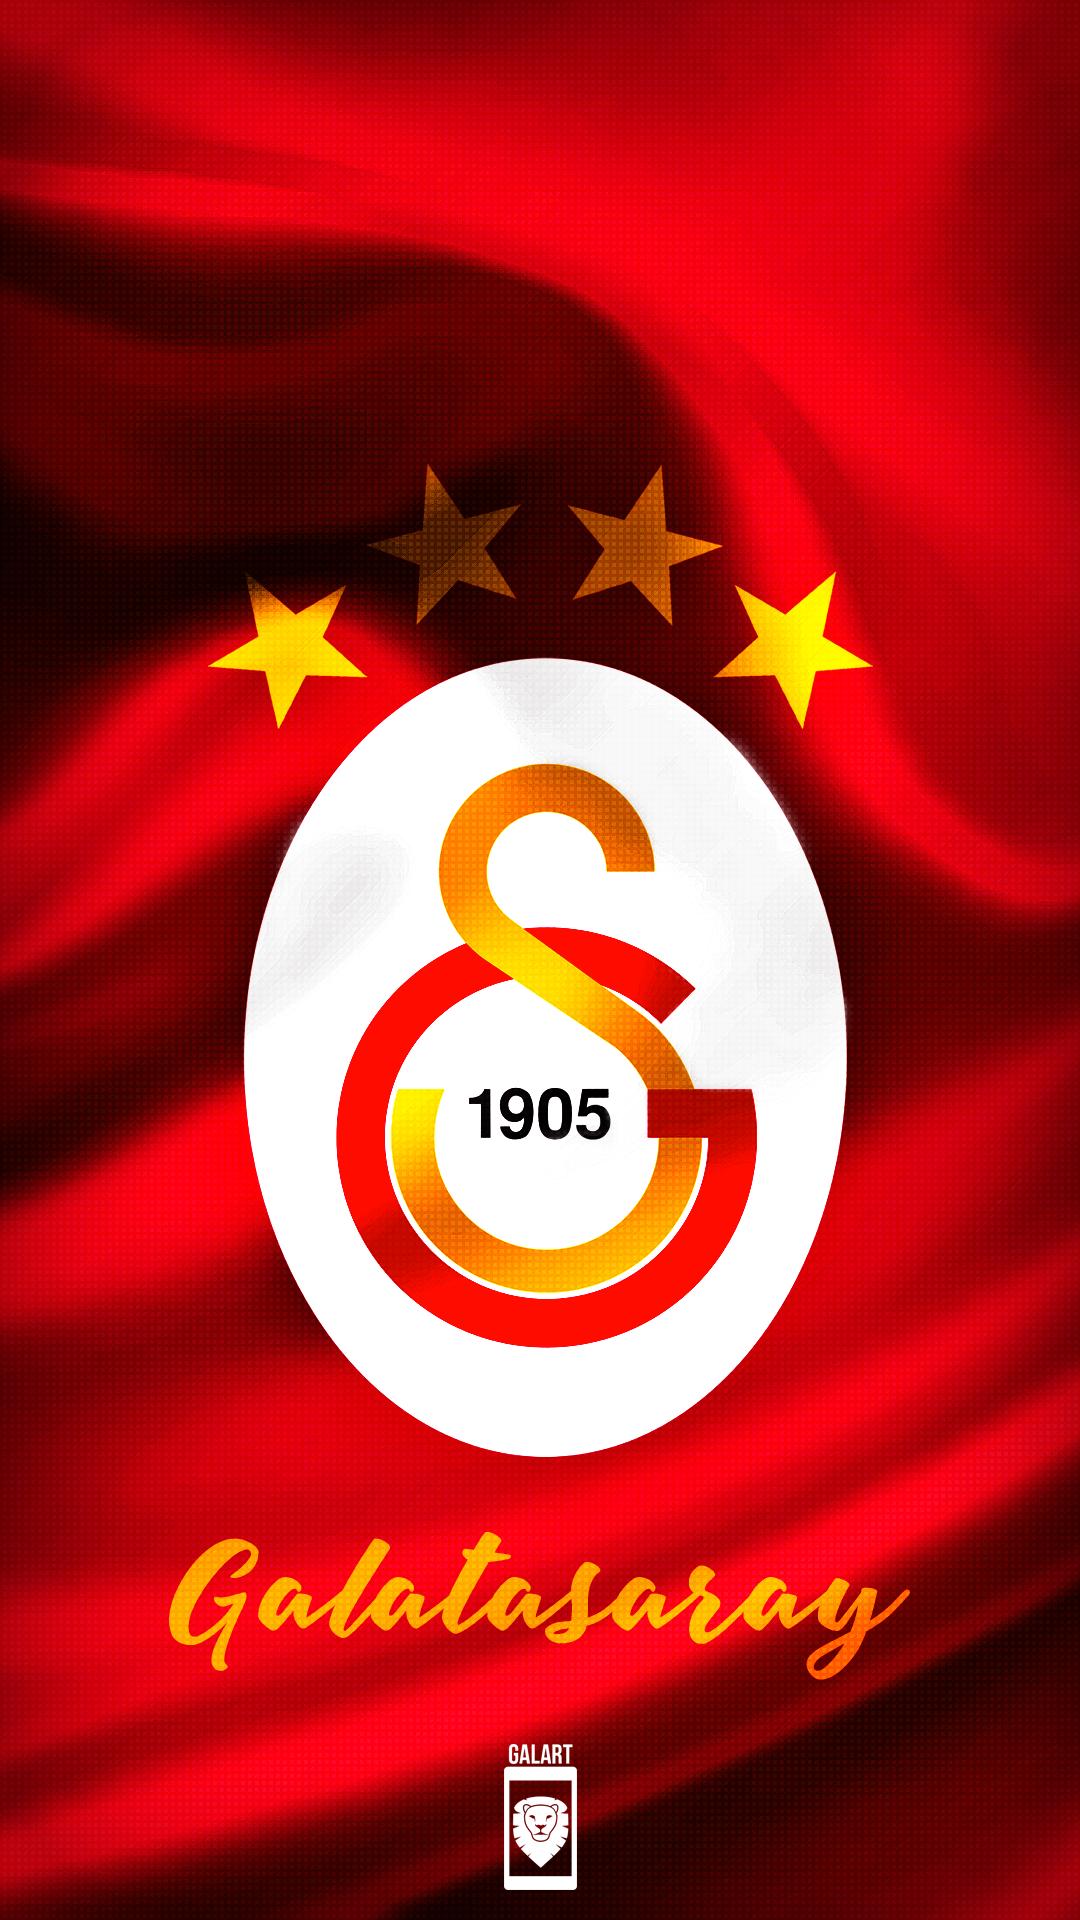 Galatasaray duvar kagidi by galart1905 on deviantart for Cama quinsay